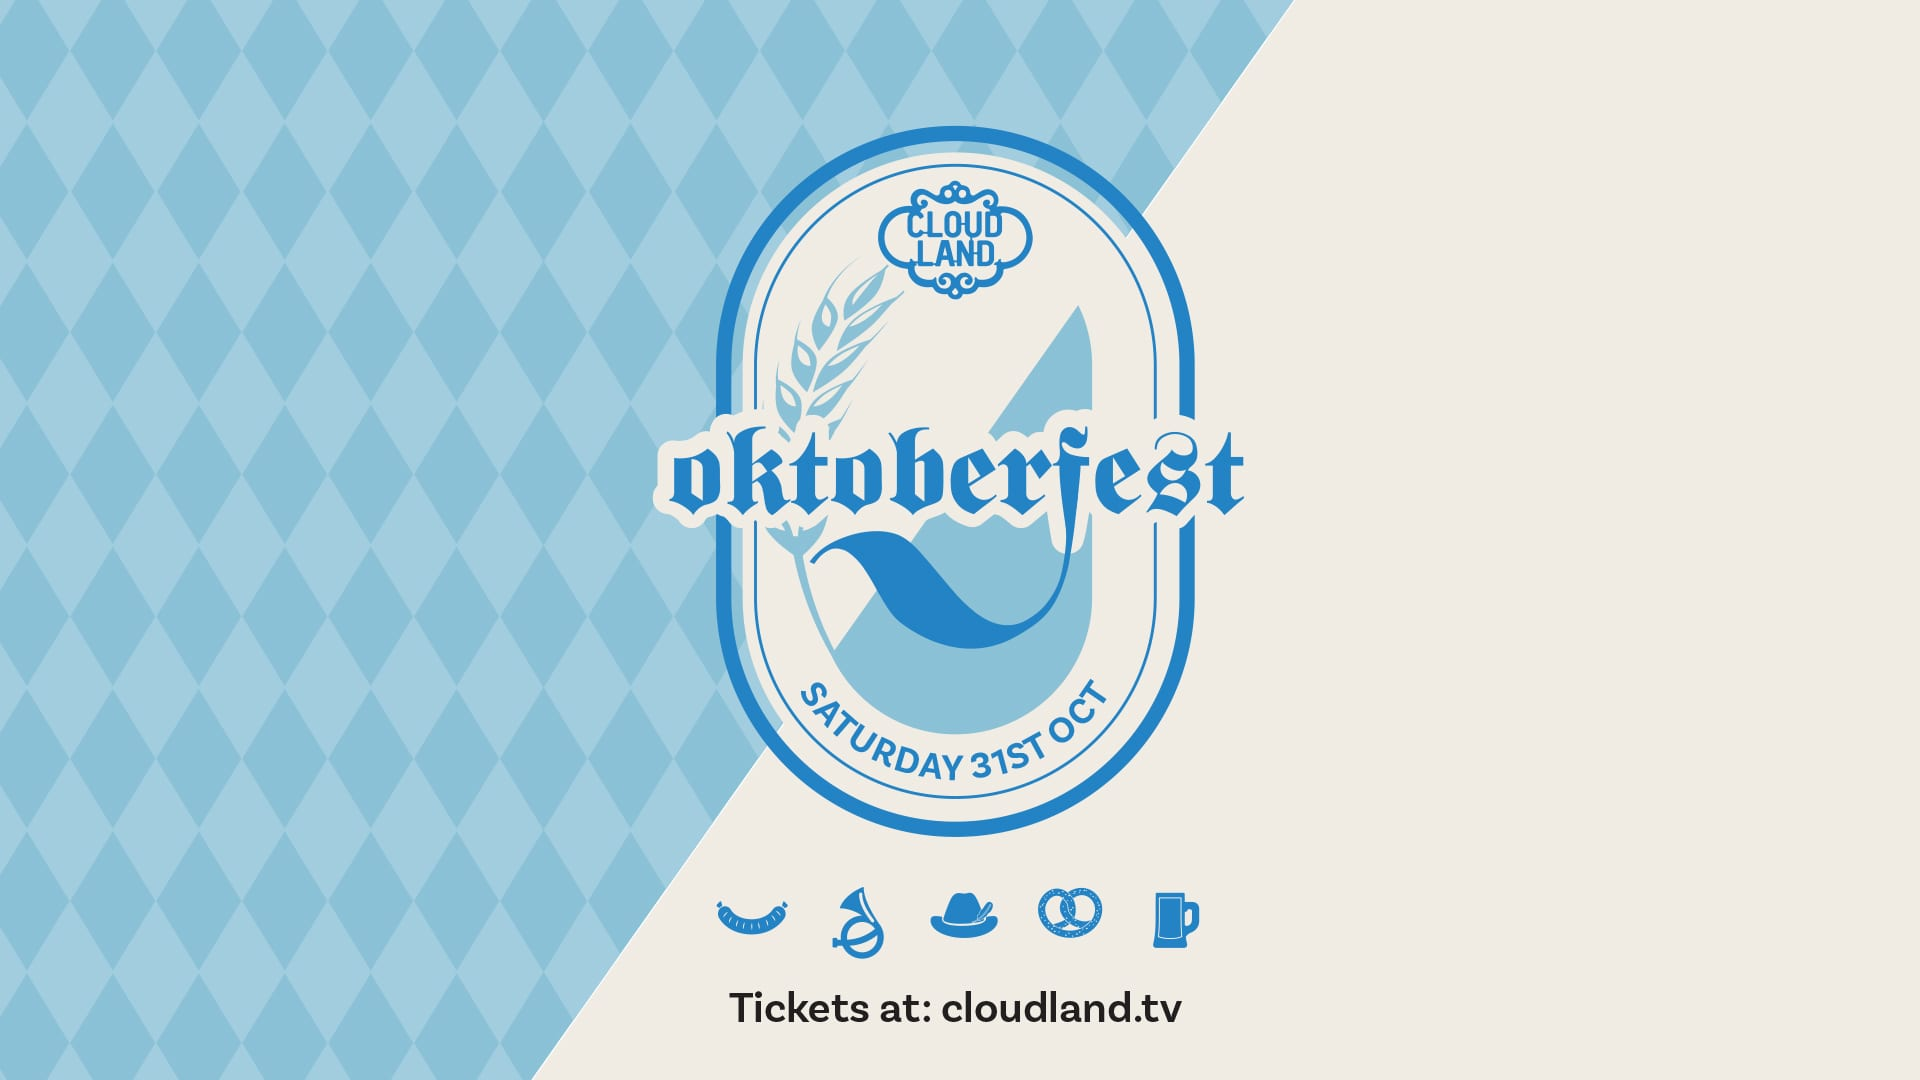 Oktoberfest Brisbane Cloudland